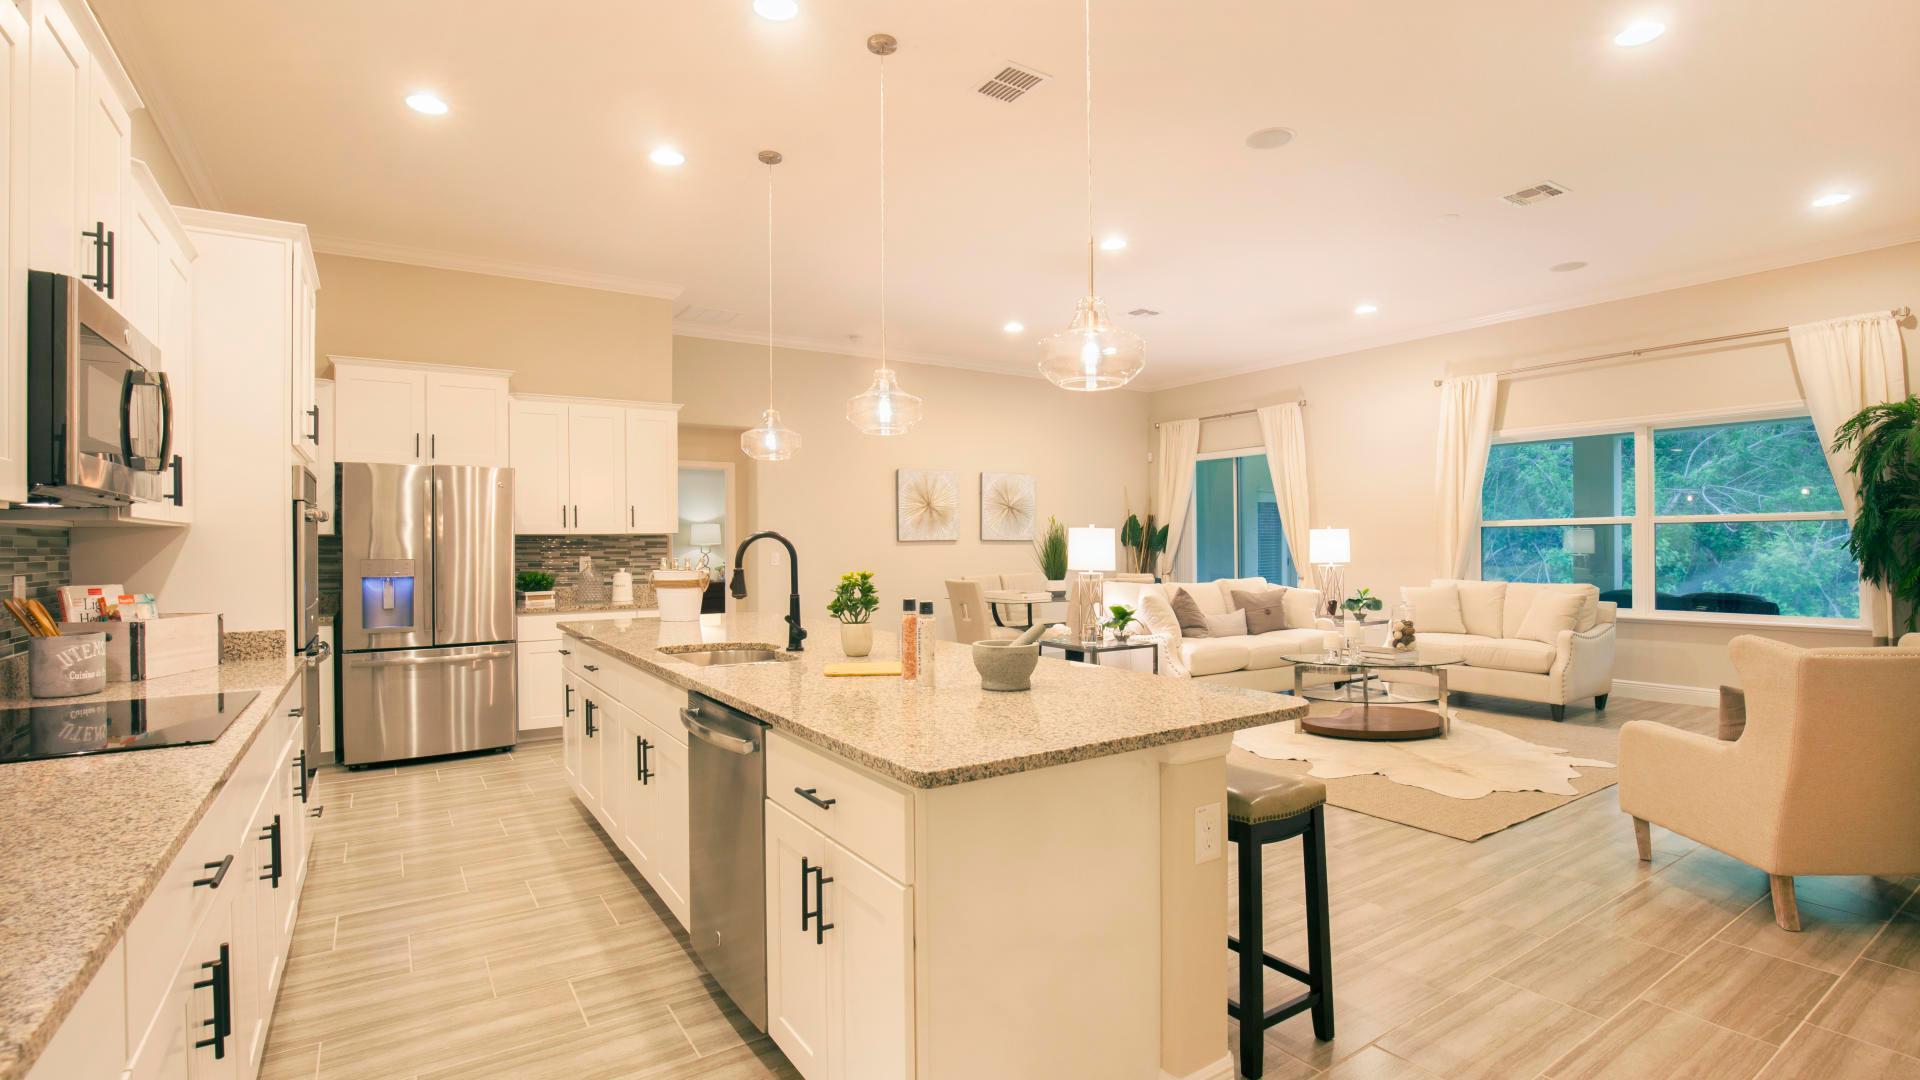 Kitchen featured in the Livorno By Maronda Homes in Melbourne, FL